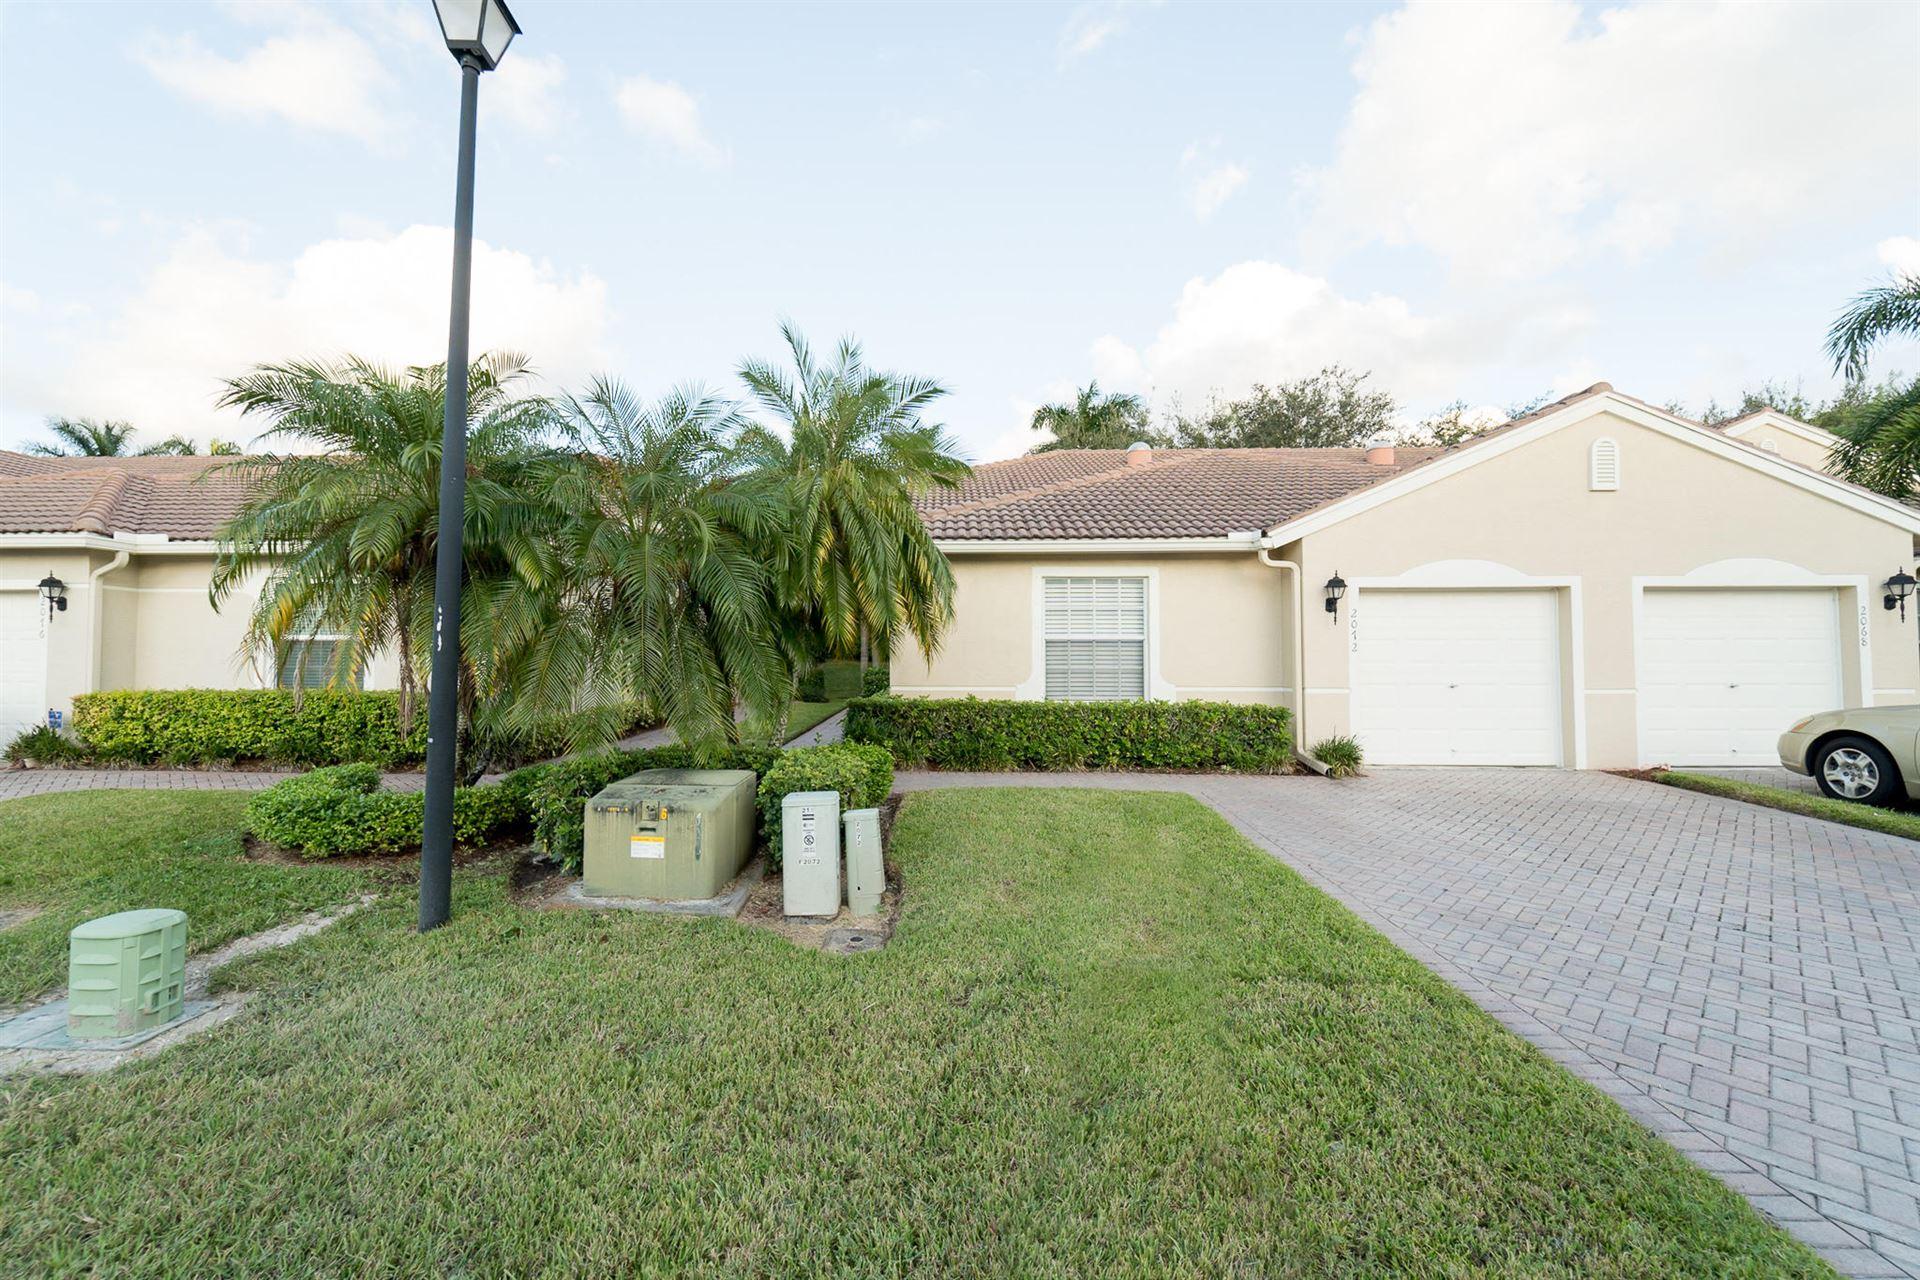 2072 Misty Shores Way, West Palm Beach, FL 33411 - #: RX-10616455